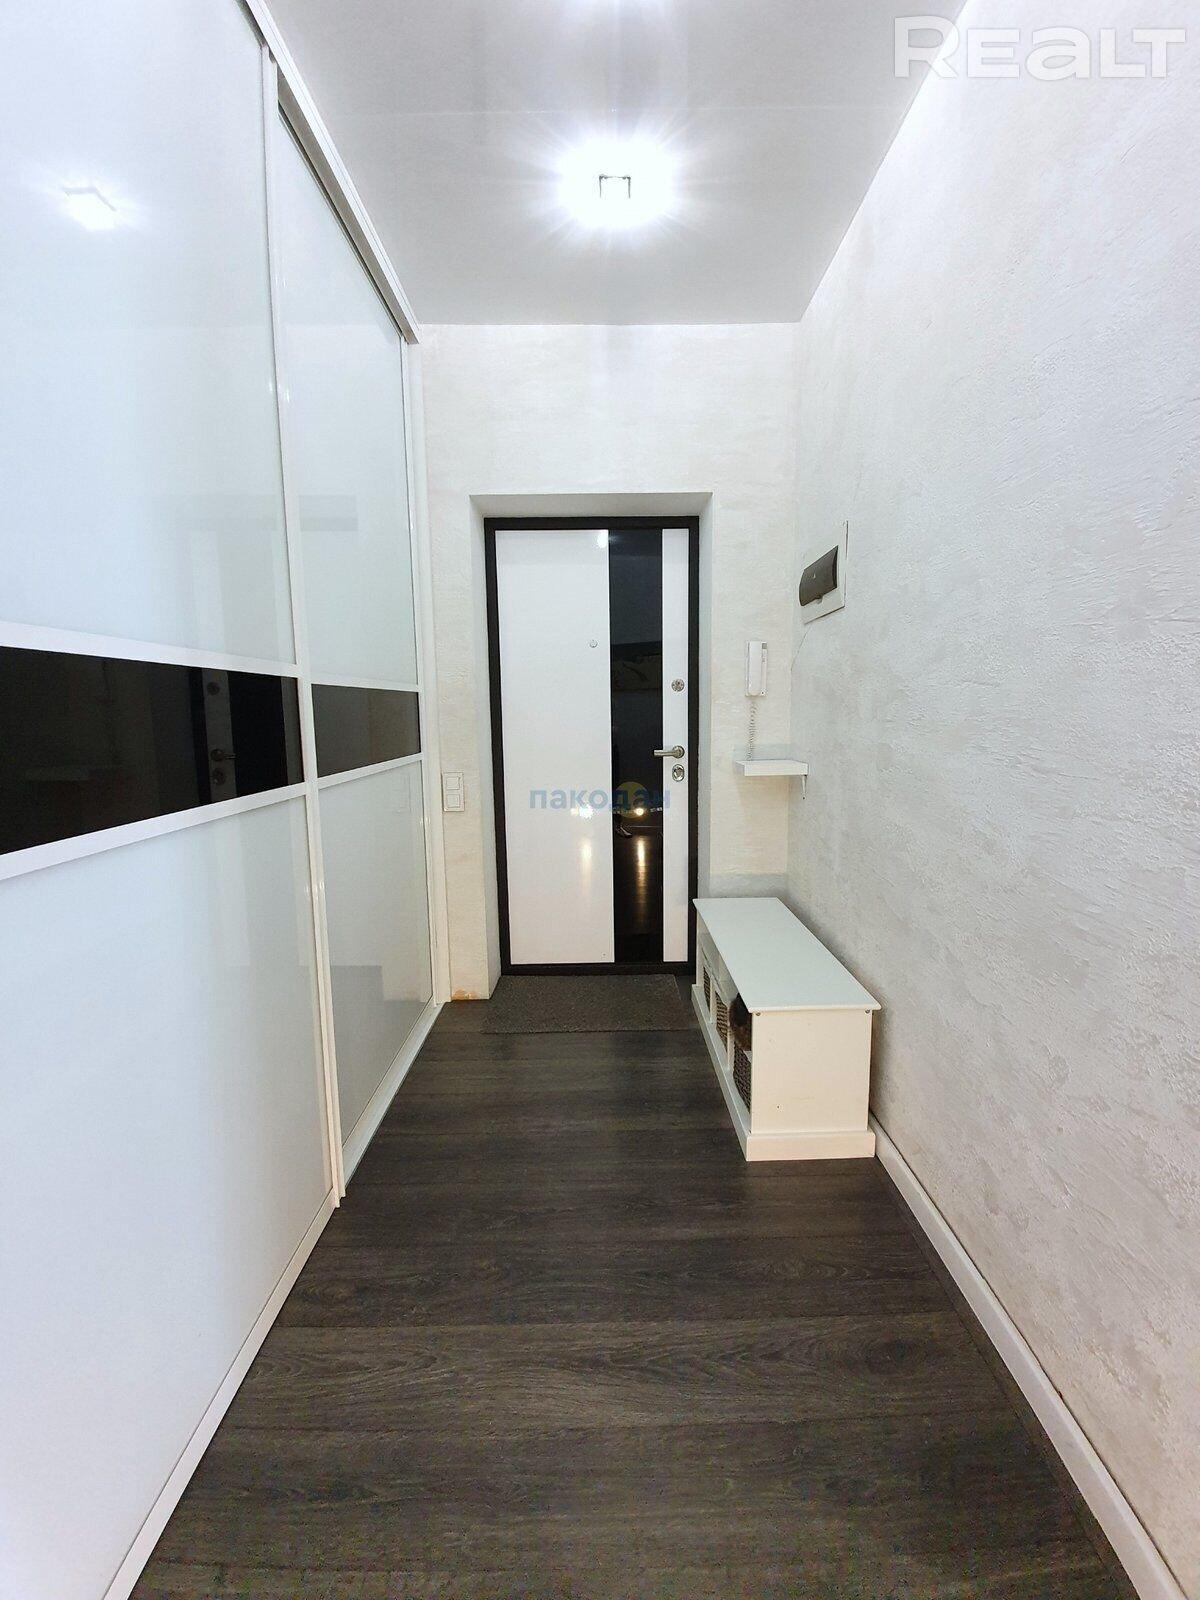 Продается 3-х комнатная квартира, Копище - фото №29